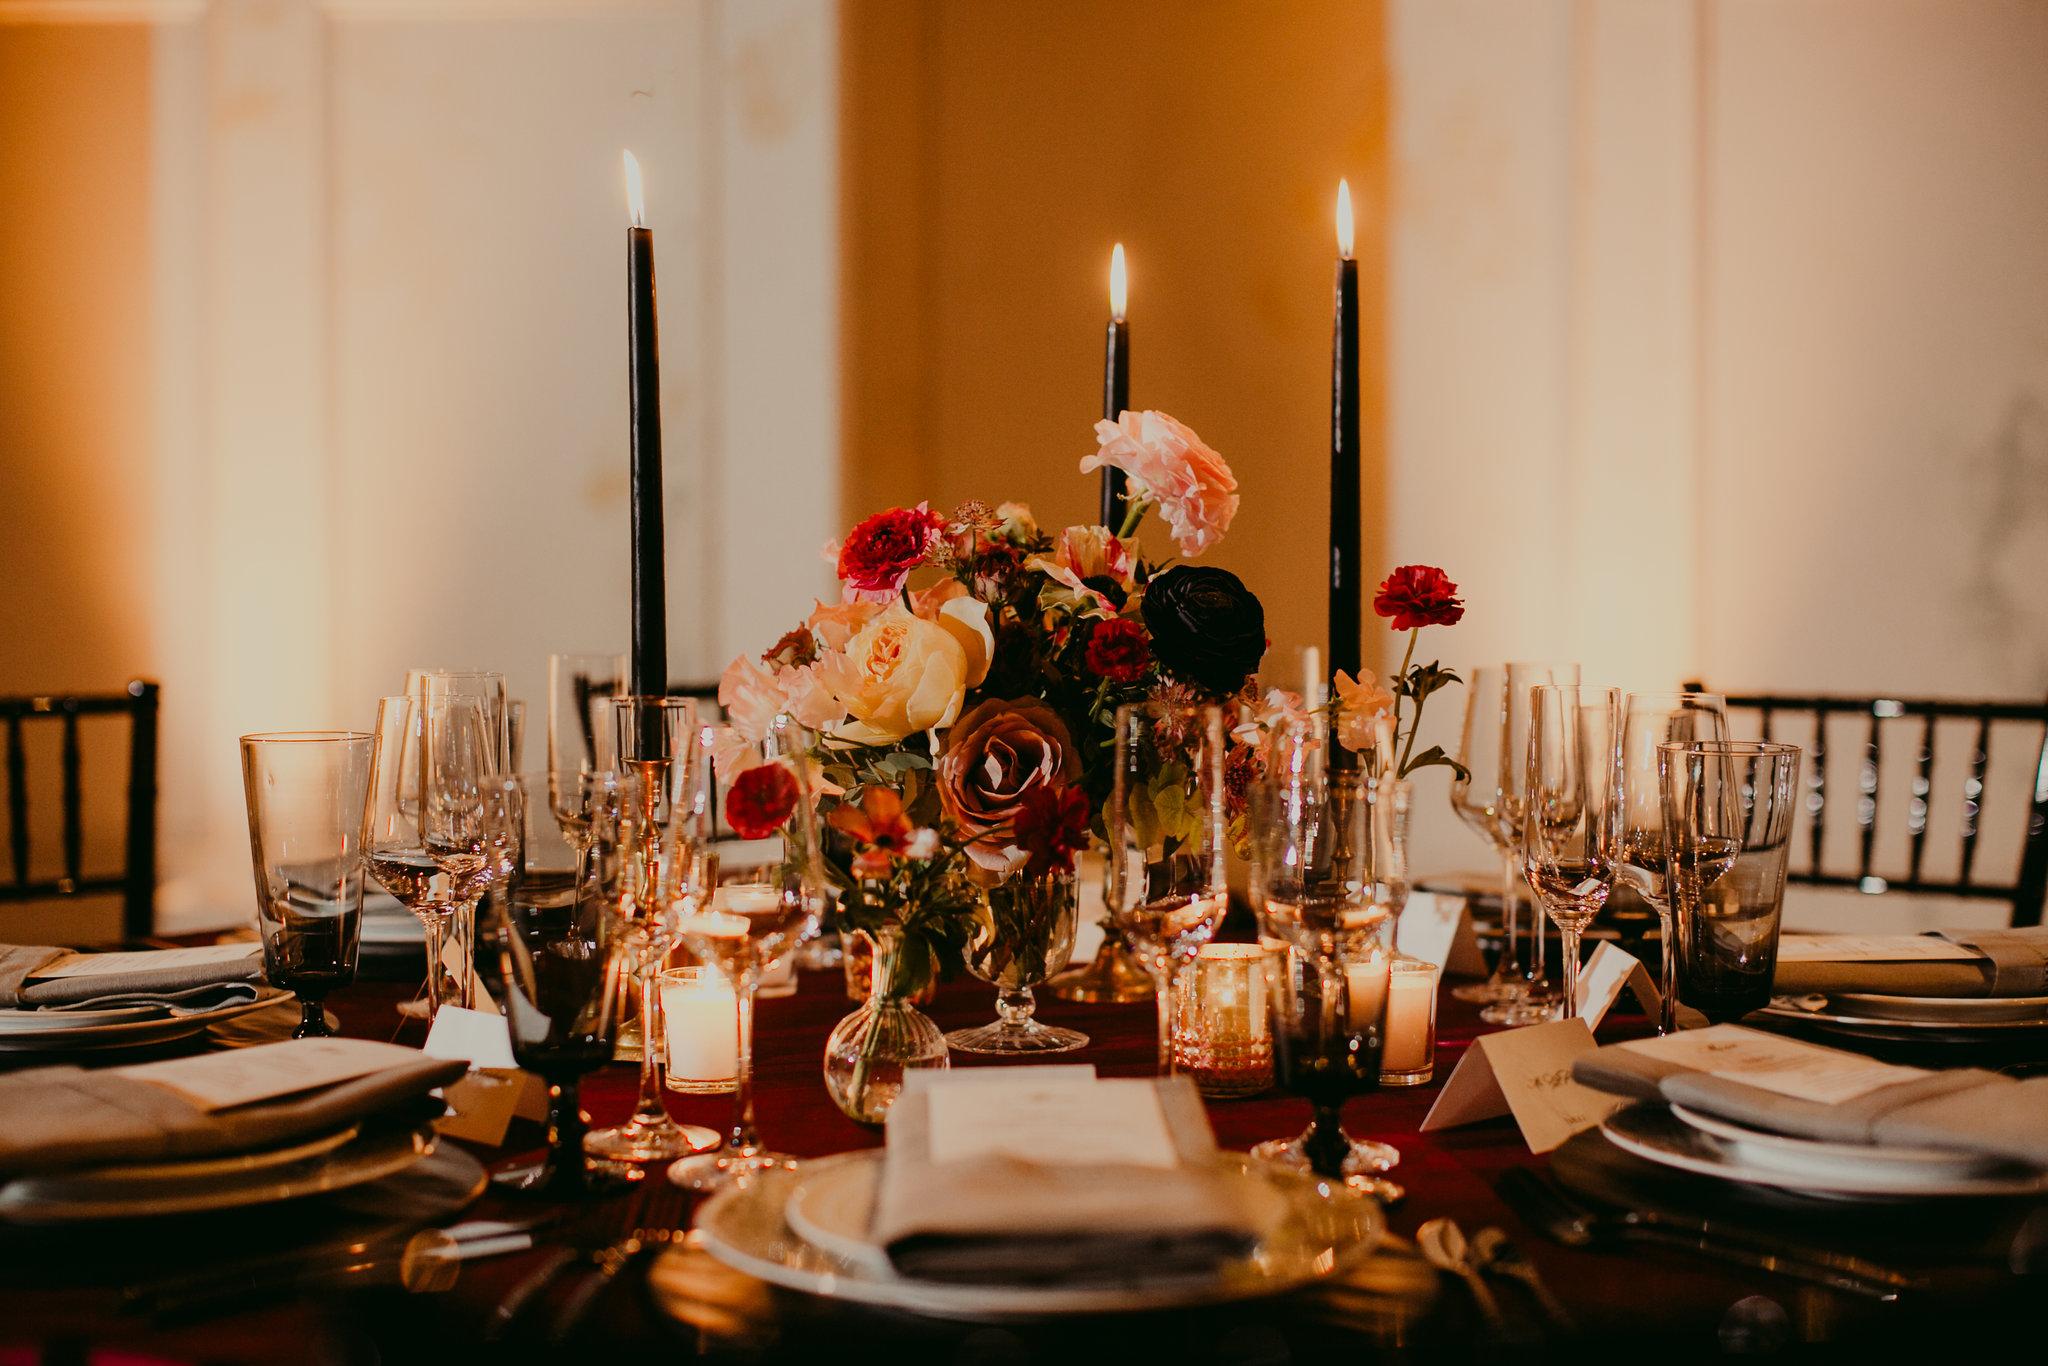 Williamsburg_Hotel_Wedding_Photographer_Chellise_Michael_Photography-265.jpg